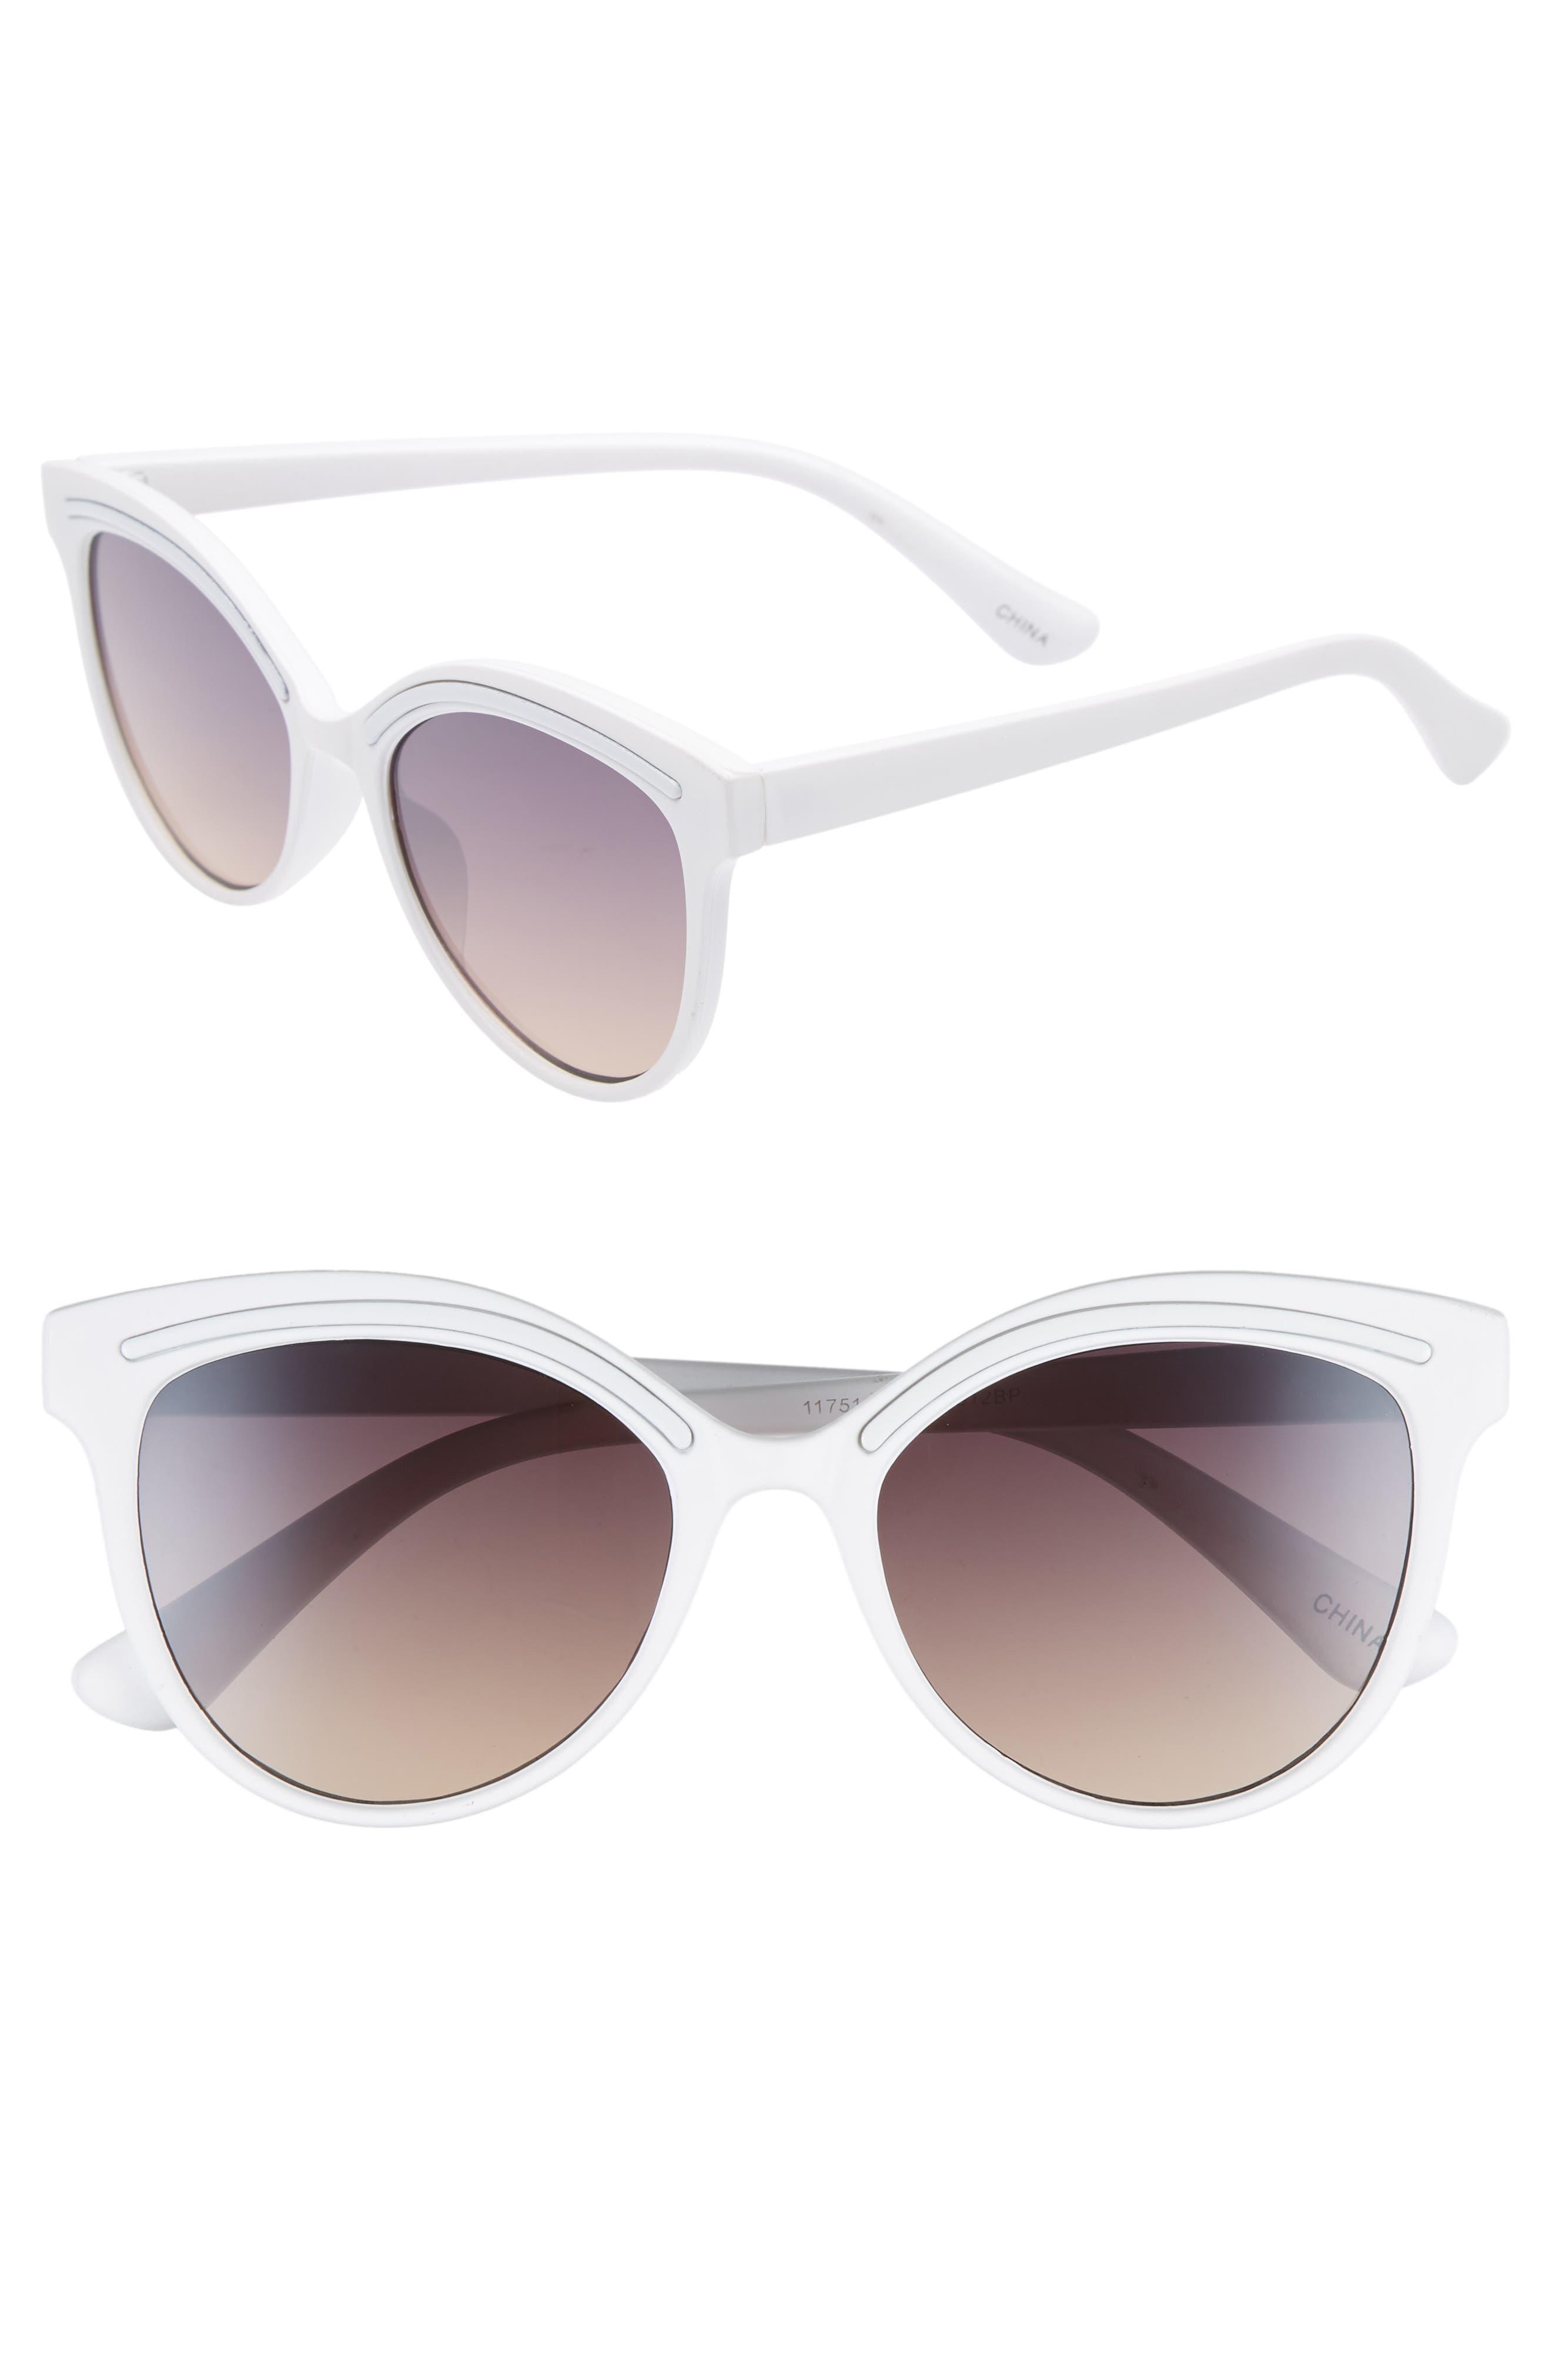 Main Image - BP. 59mm Metallic Accent Cat Eye Sunglasses